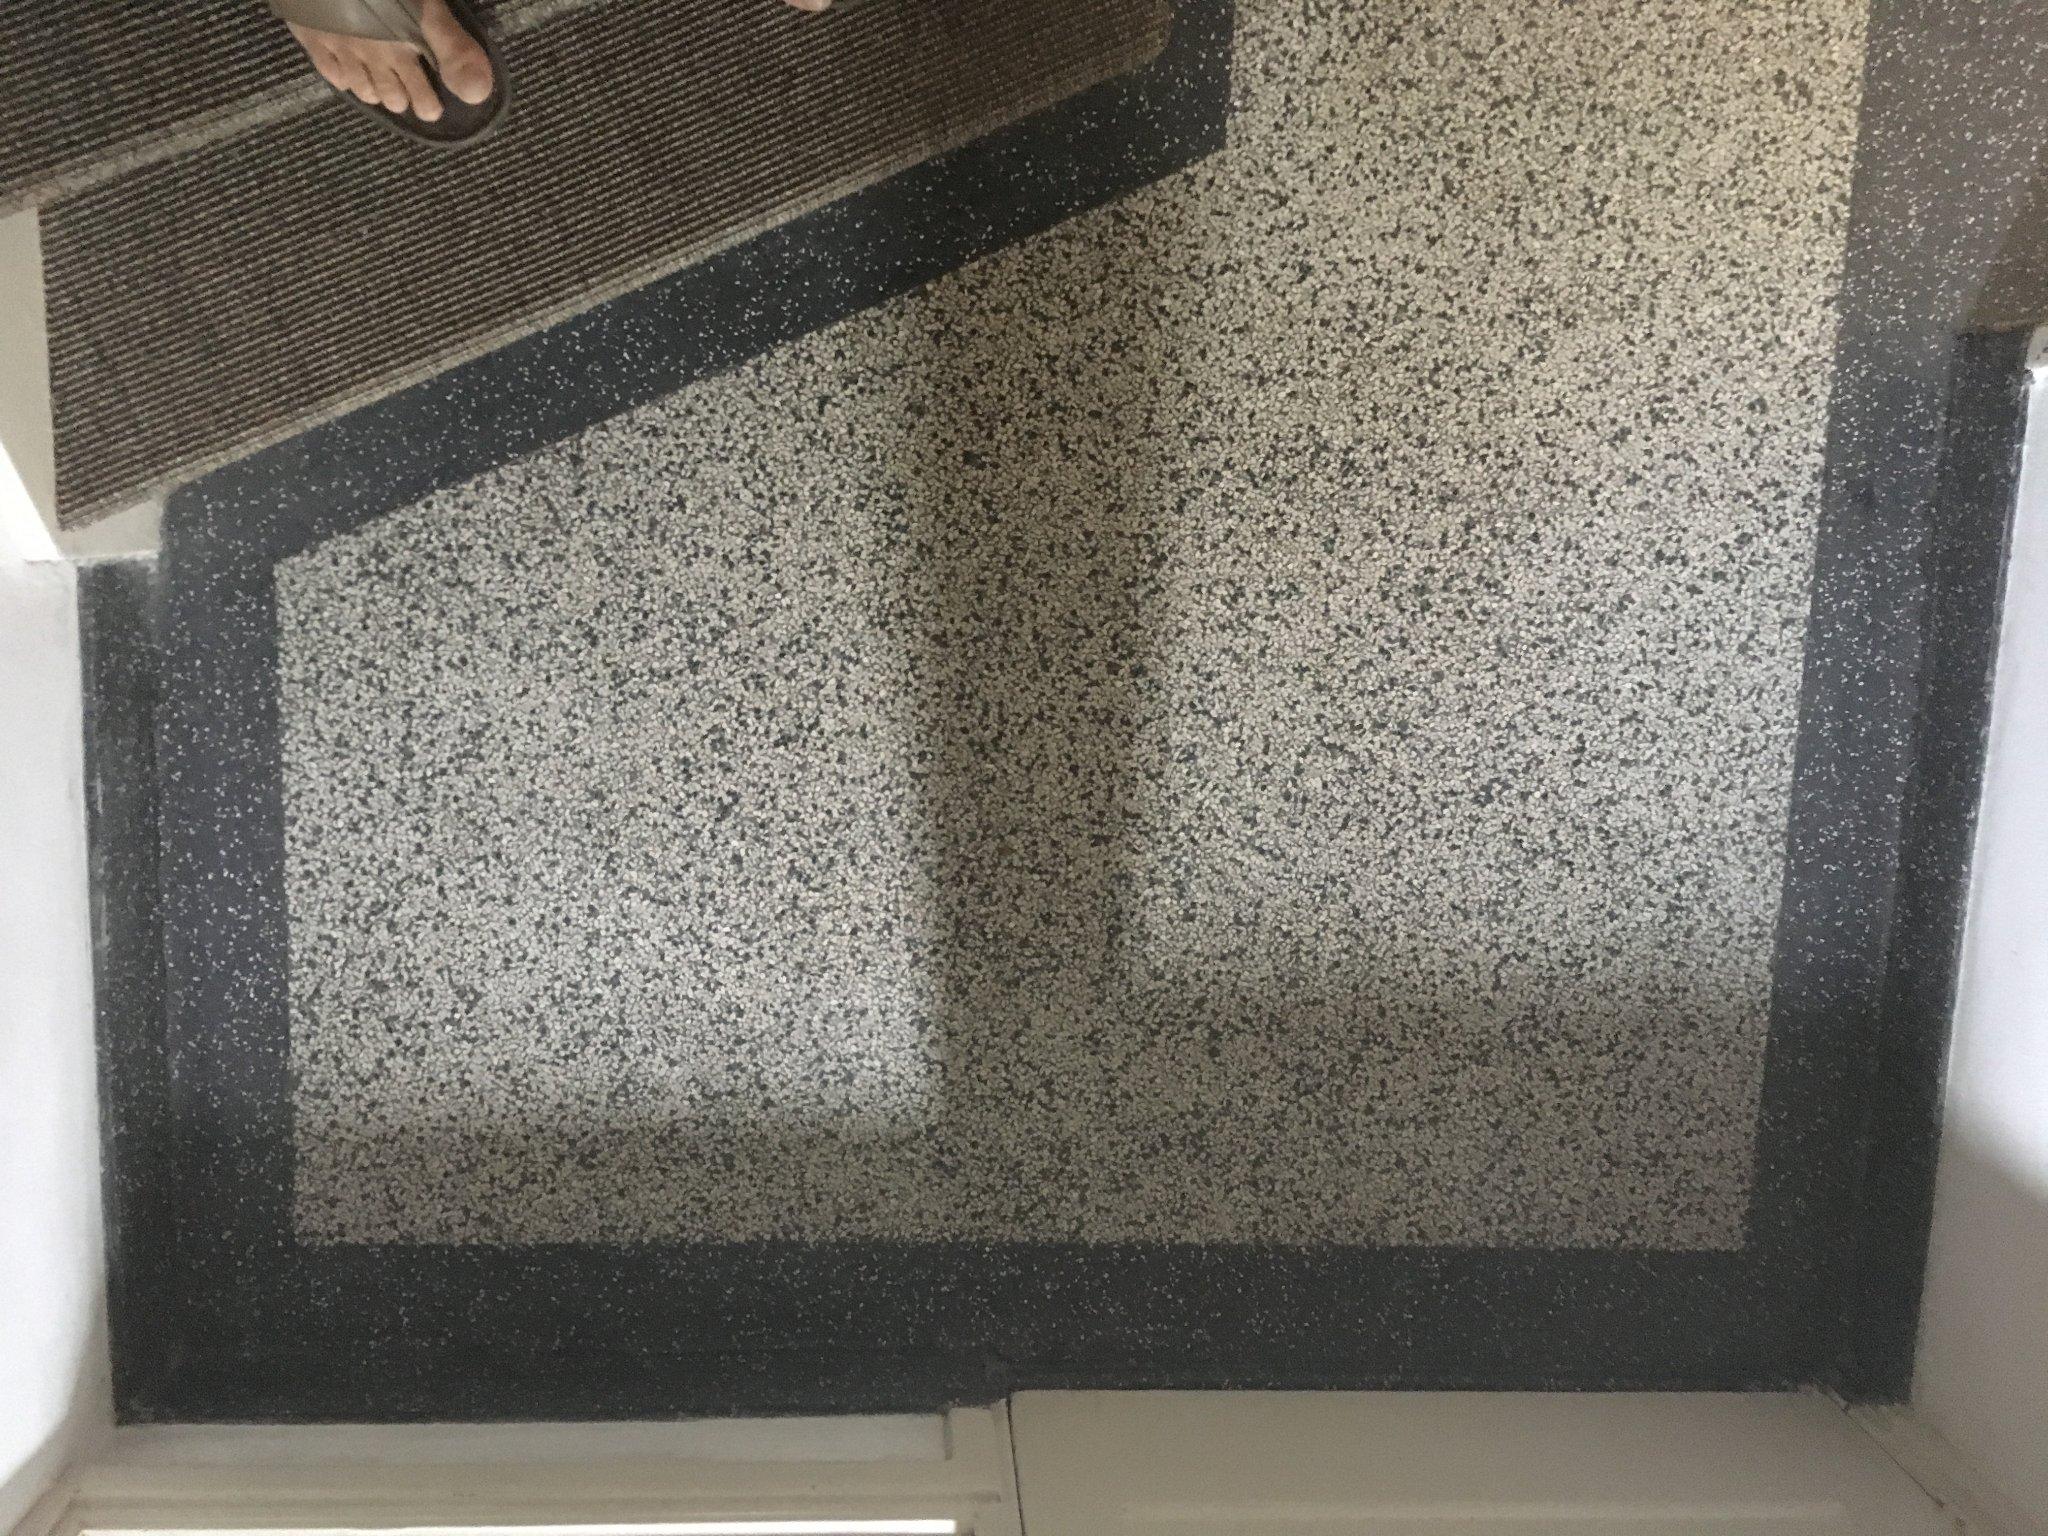 Granieten vloer badkamer toepassing with granieten vloer badkamer